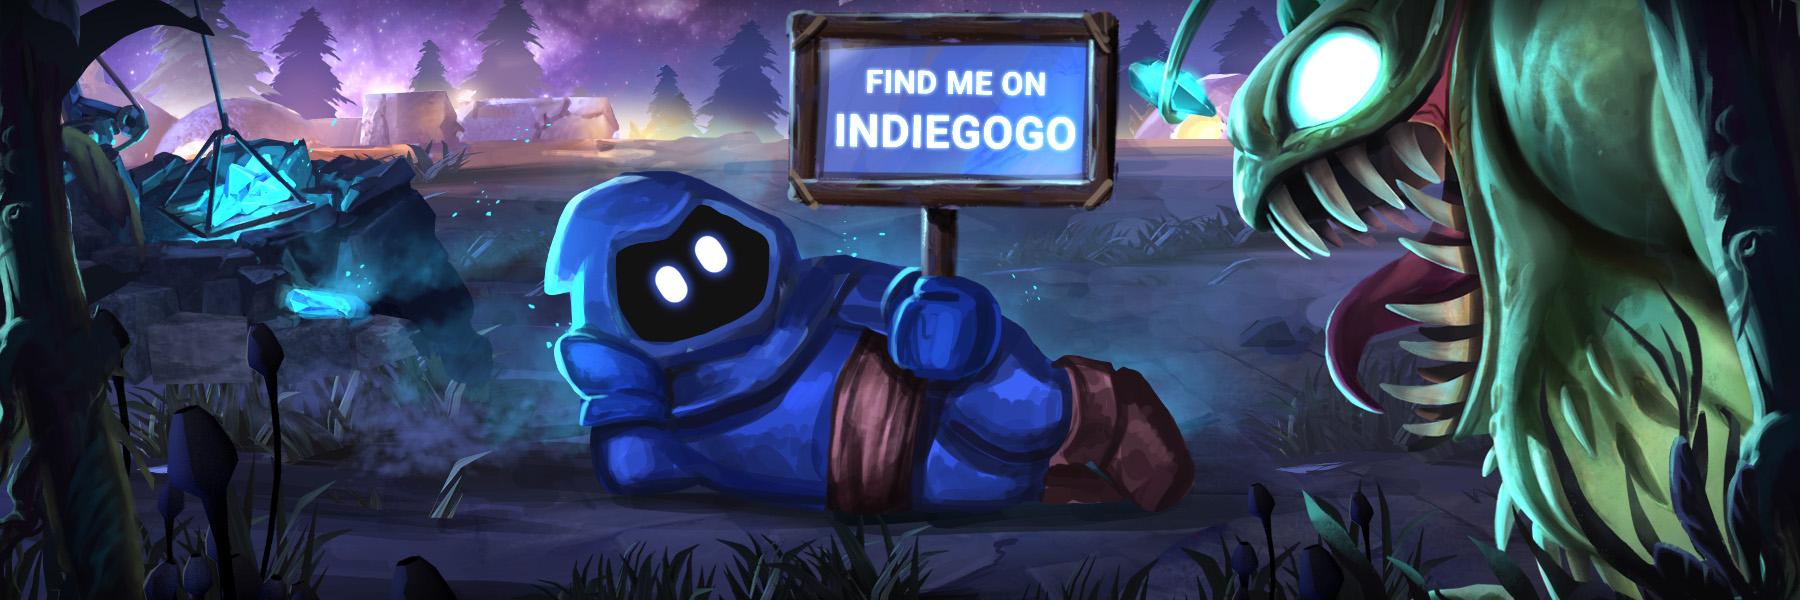 Join us at Indiegogo